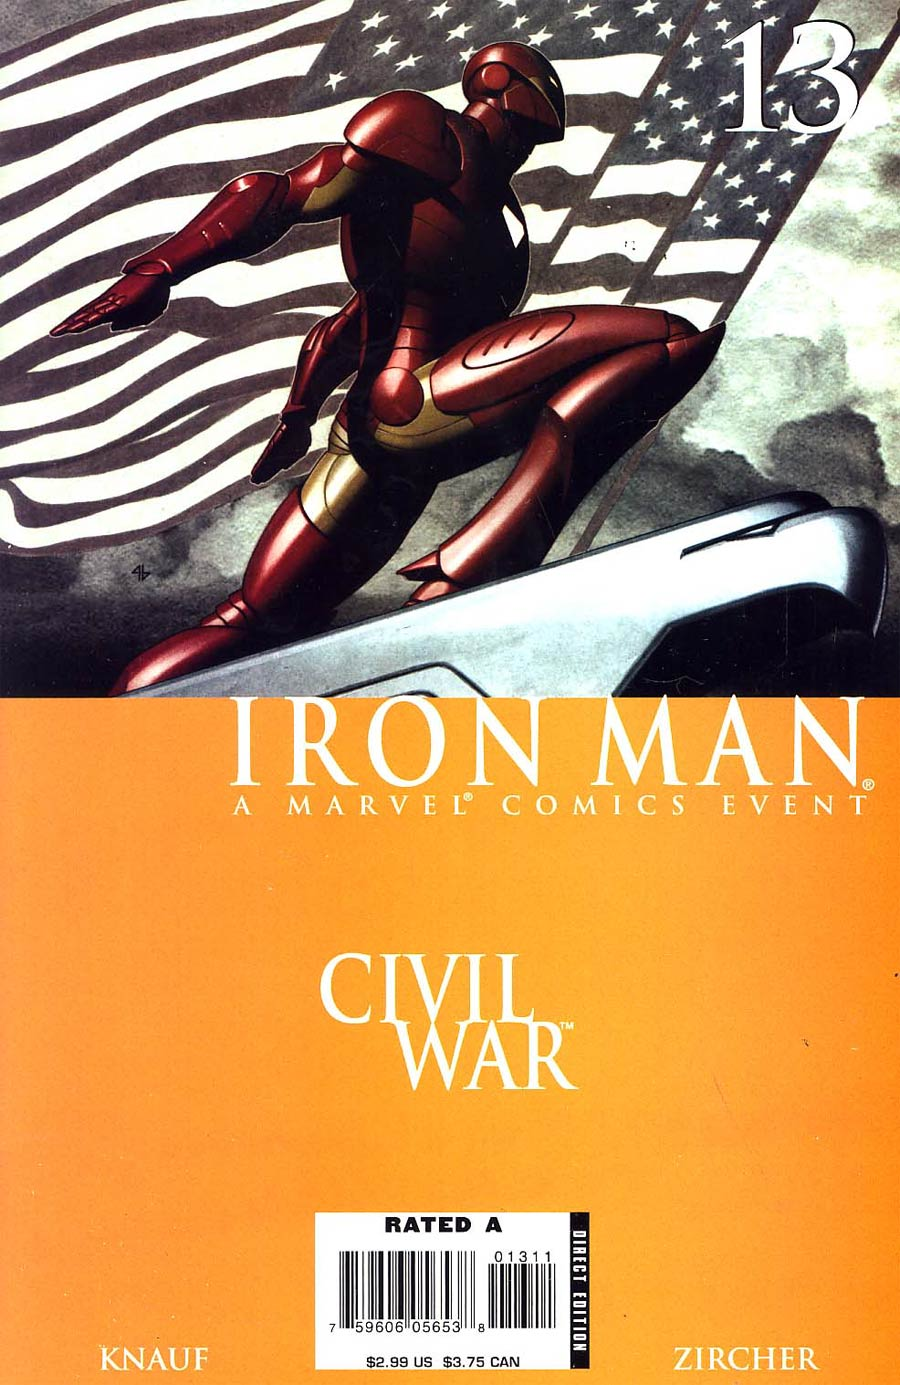 Iron Man Vol 4 #13 (Civil War Tie-In)